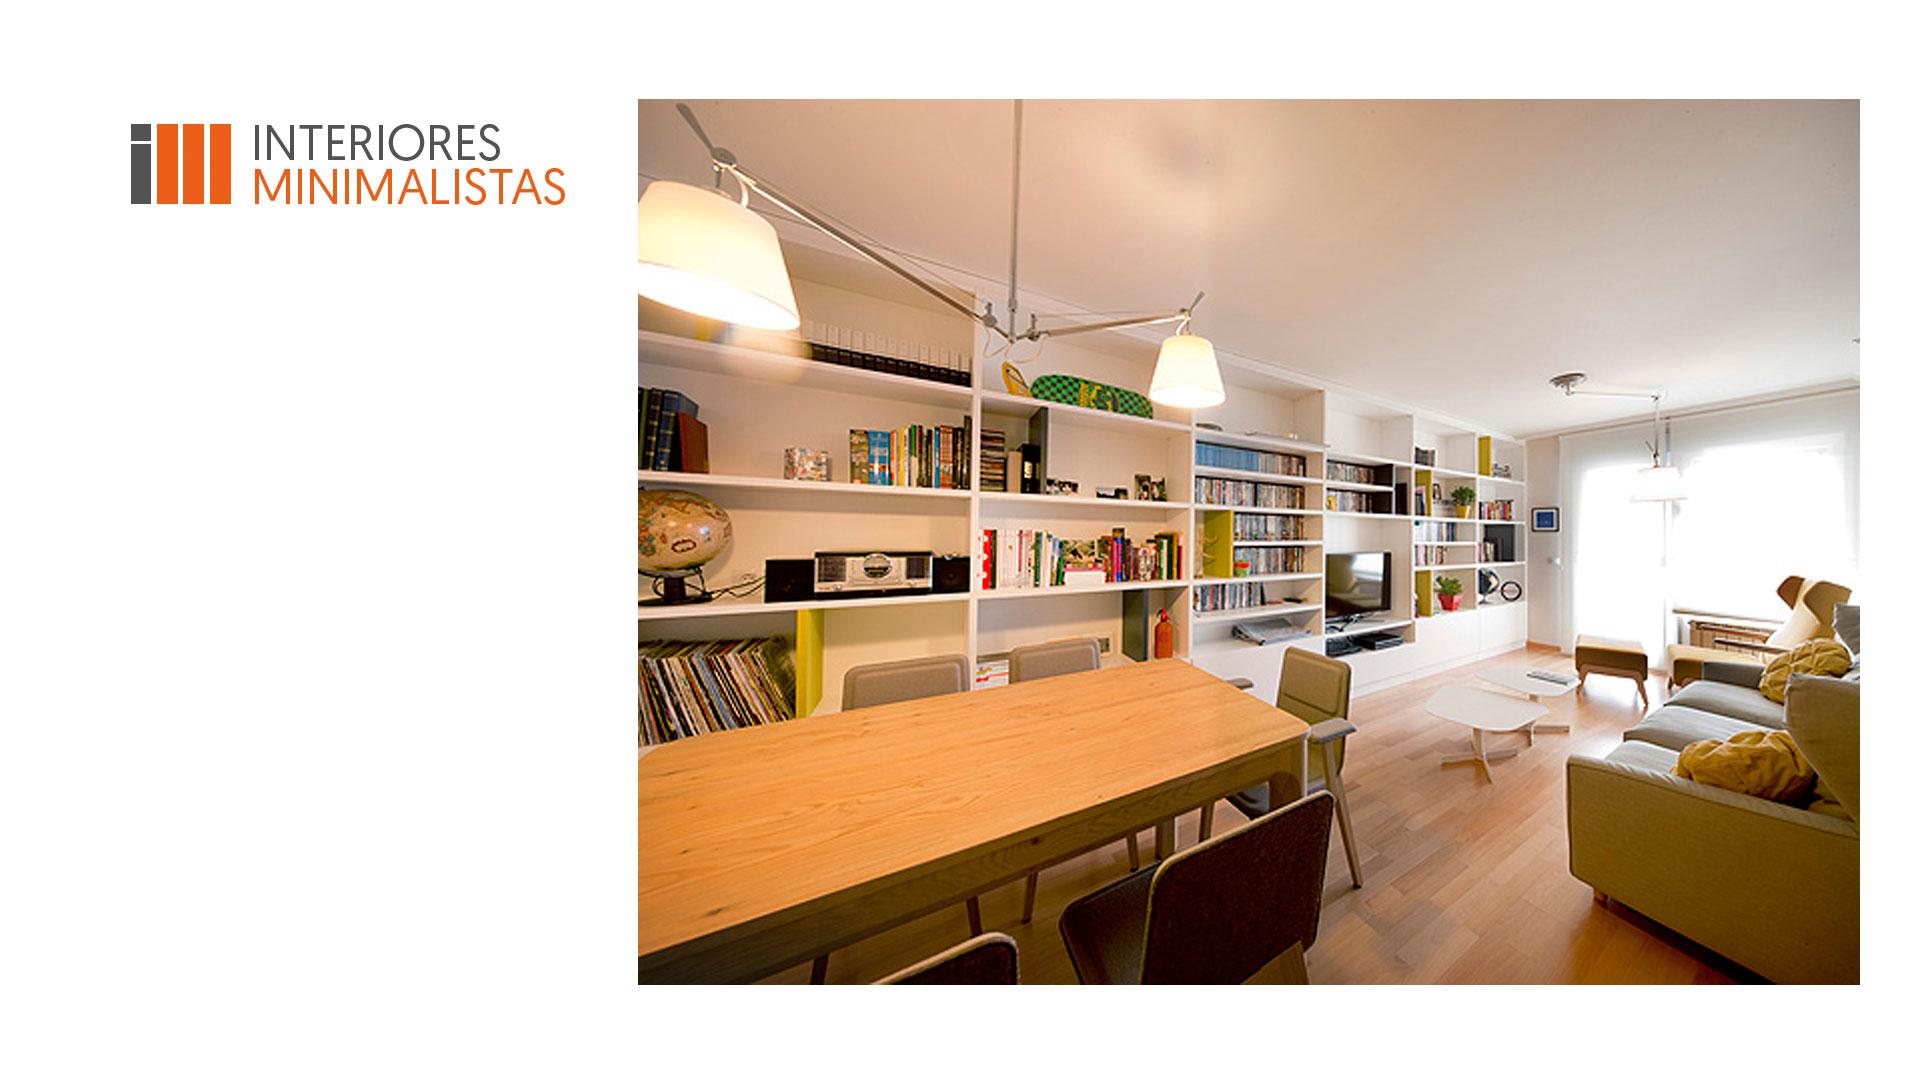 vivienda-en-leon-interiores-minimalistas